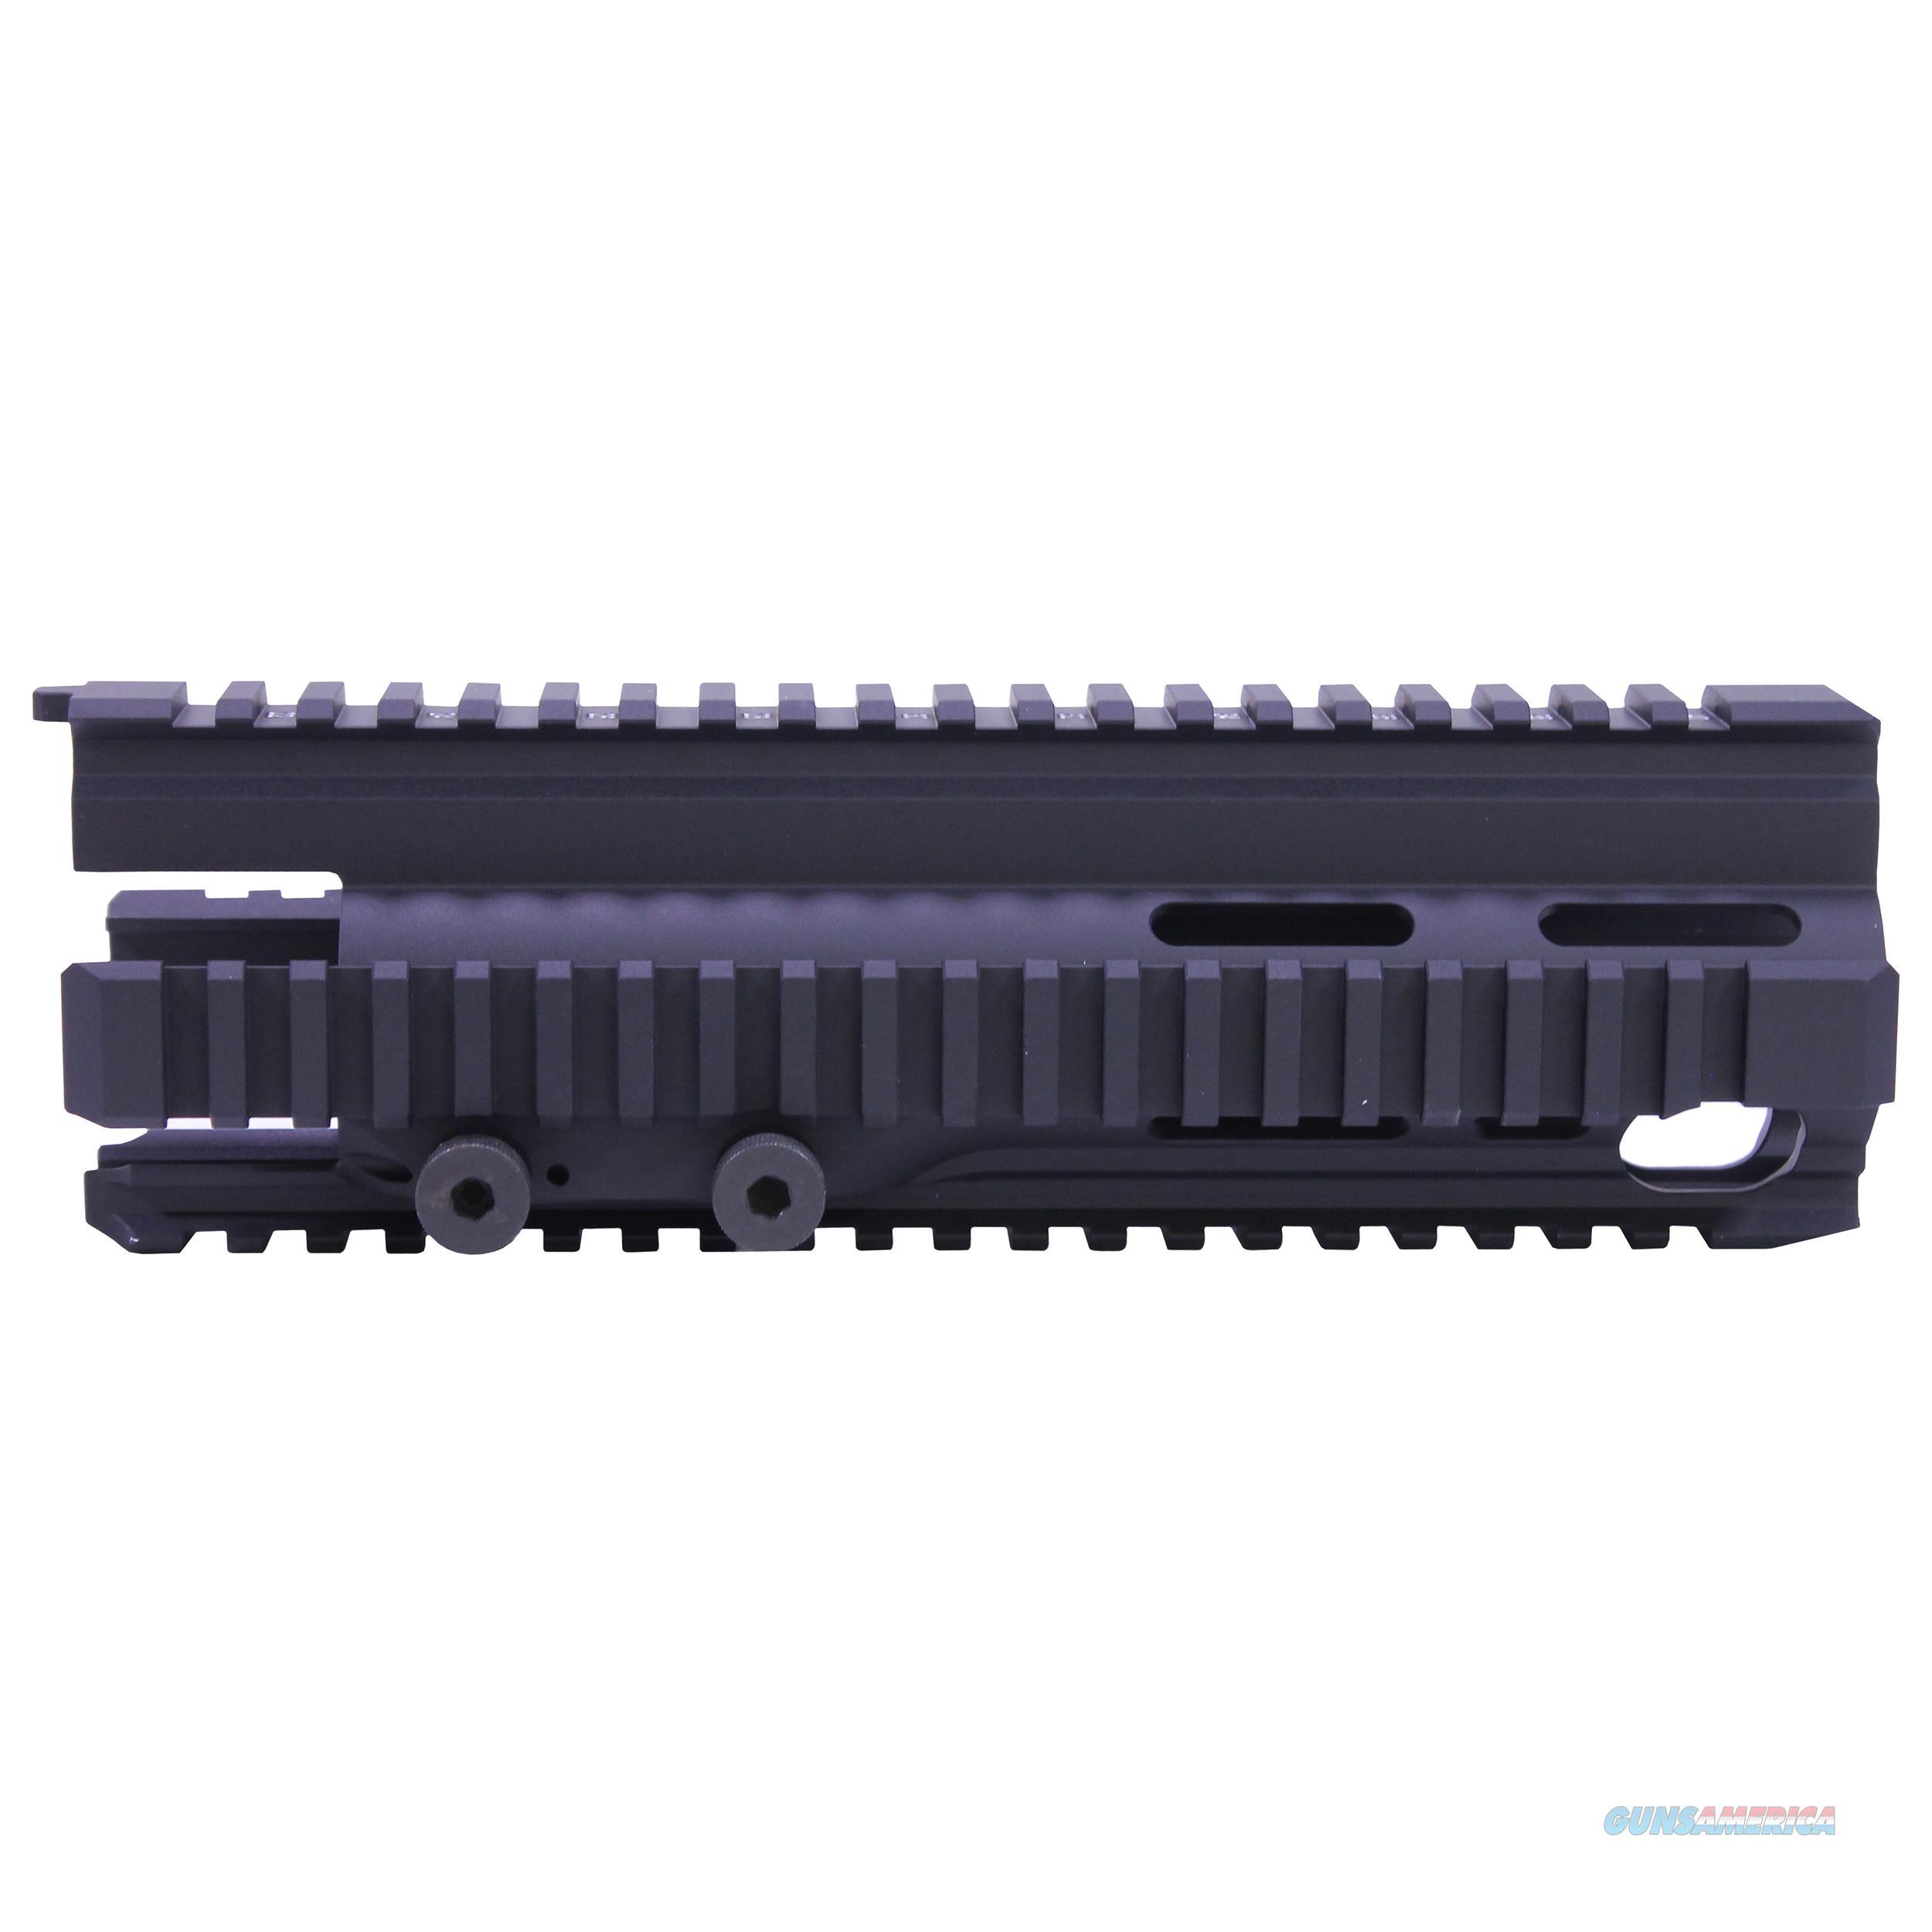 Heckler & Koch Quad Rail Handguard 235870  Non-Guns > Gunstocks, Grips & Wood